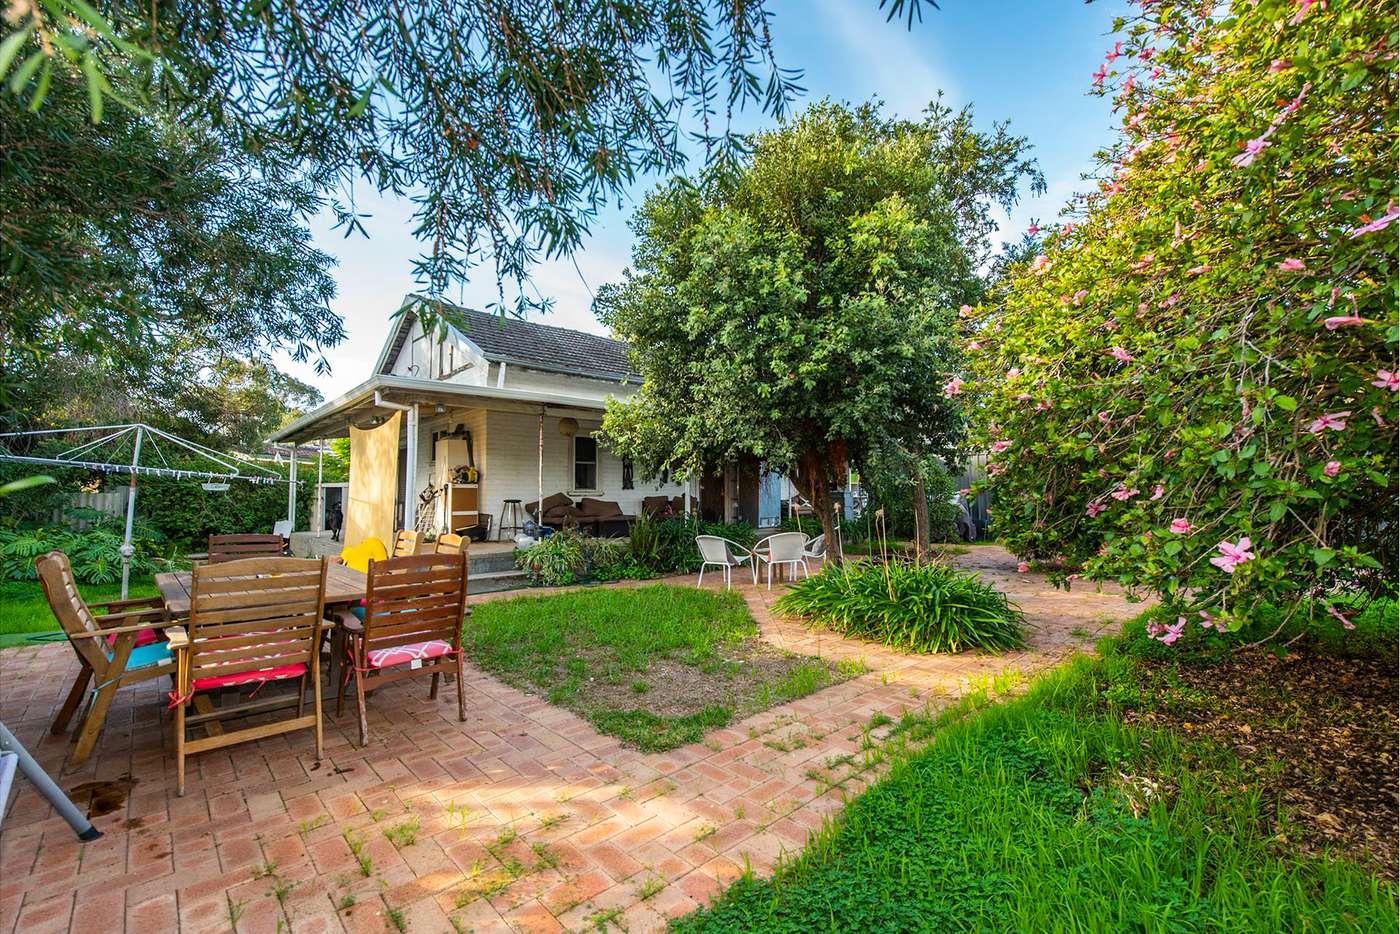 Main view of Homely house listing, 110 Canning Road, Kalamunda WA 6076